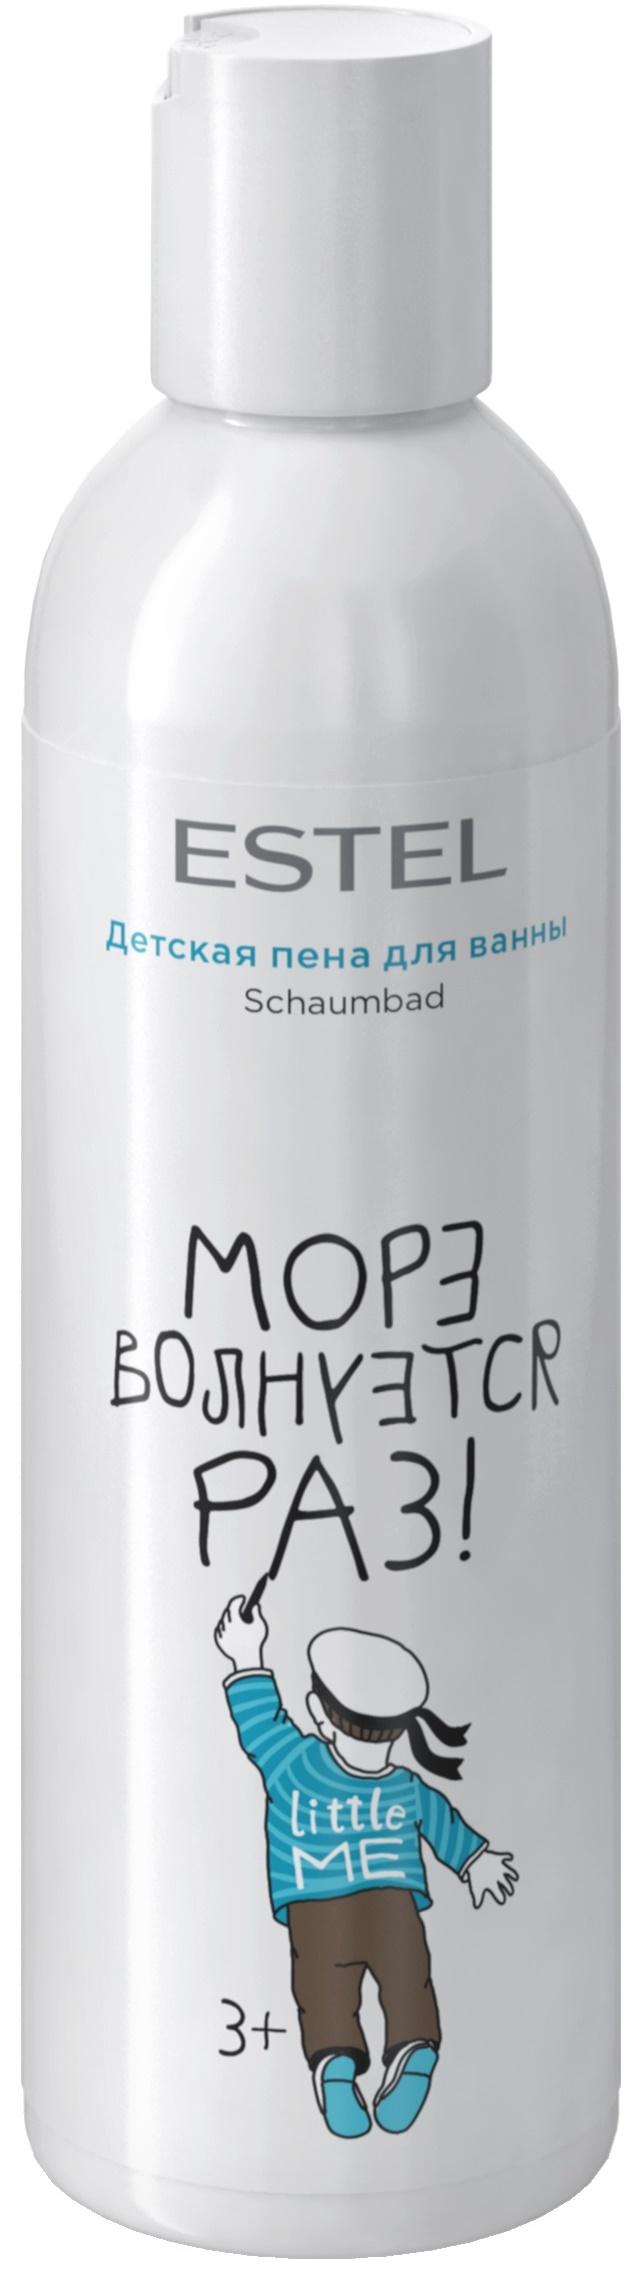 Пена для ванны ESTEL PROFESSIONAL LITTLE ME детская 500 мл